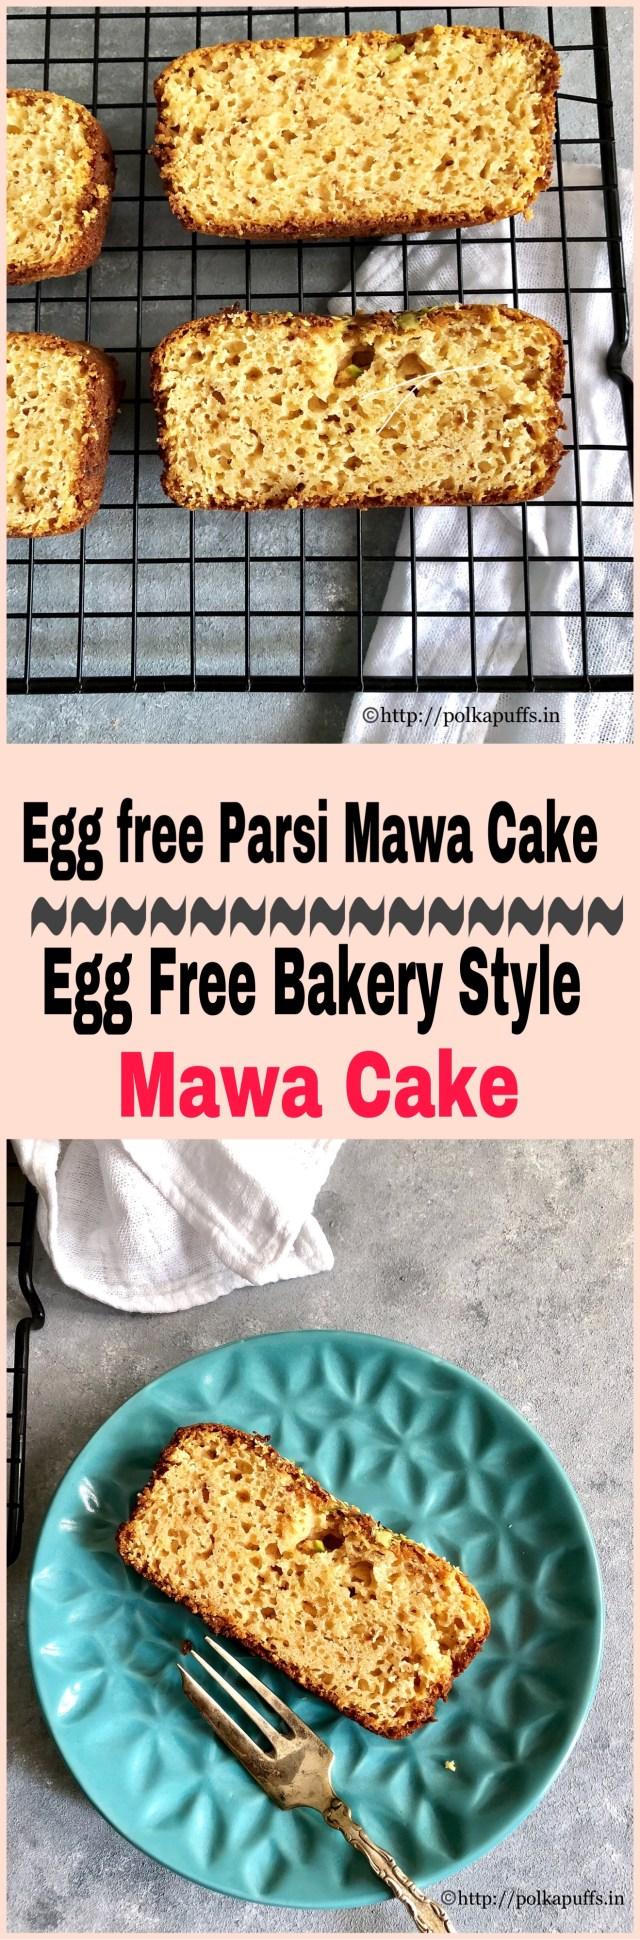 Egg free Parsi Mawa Cake   Egg free Bakery Style Mawa Cake